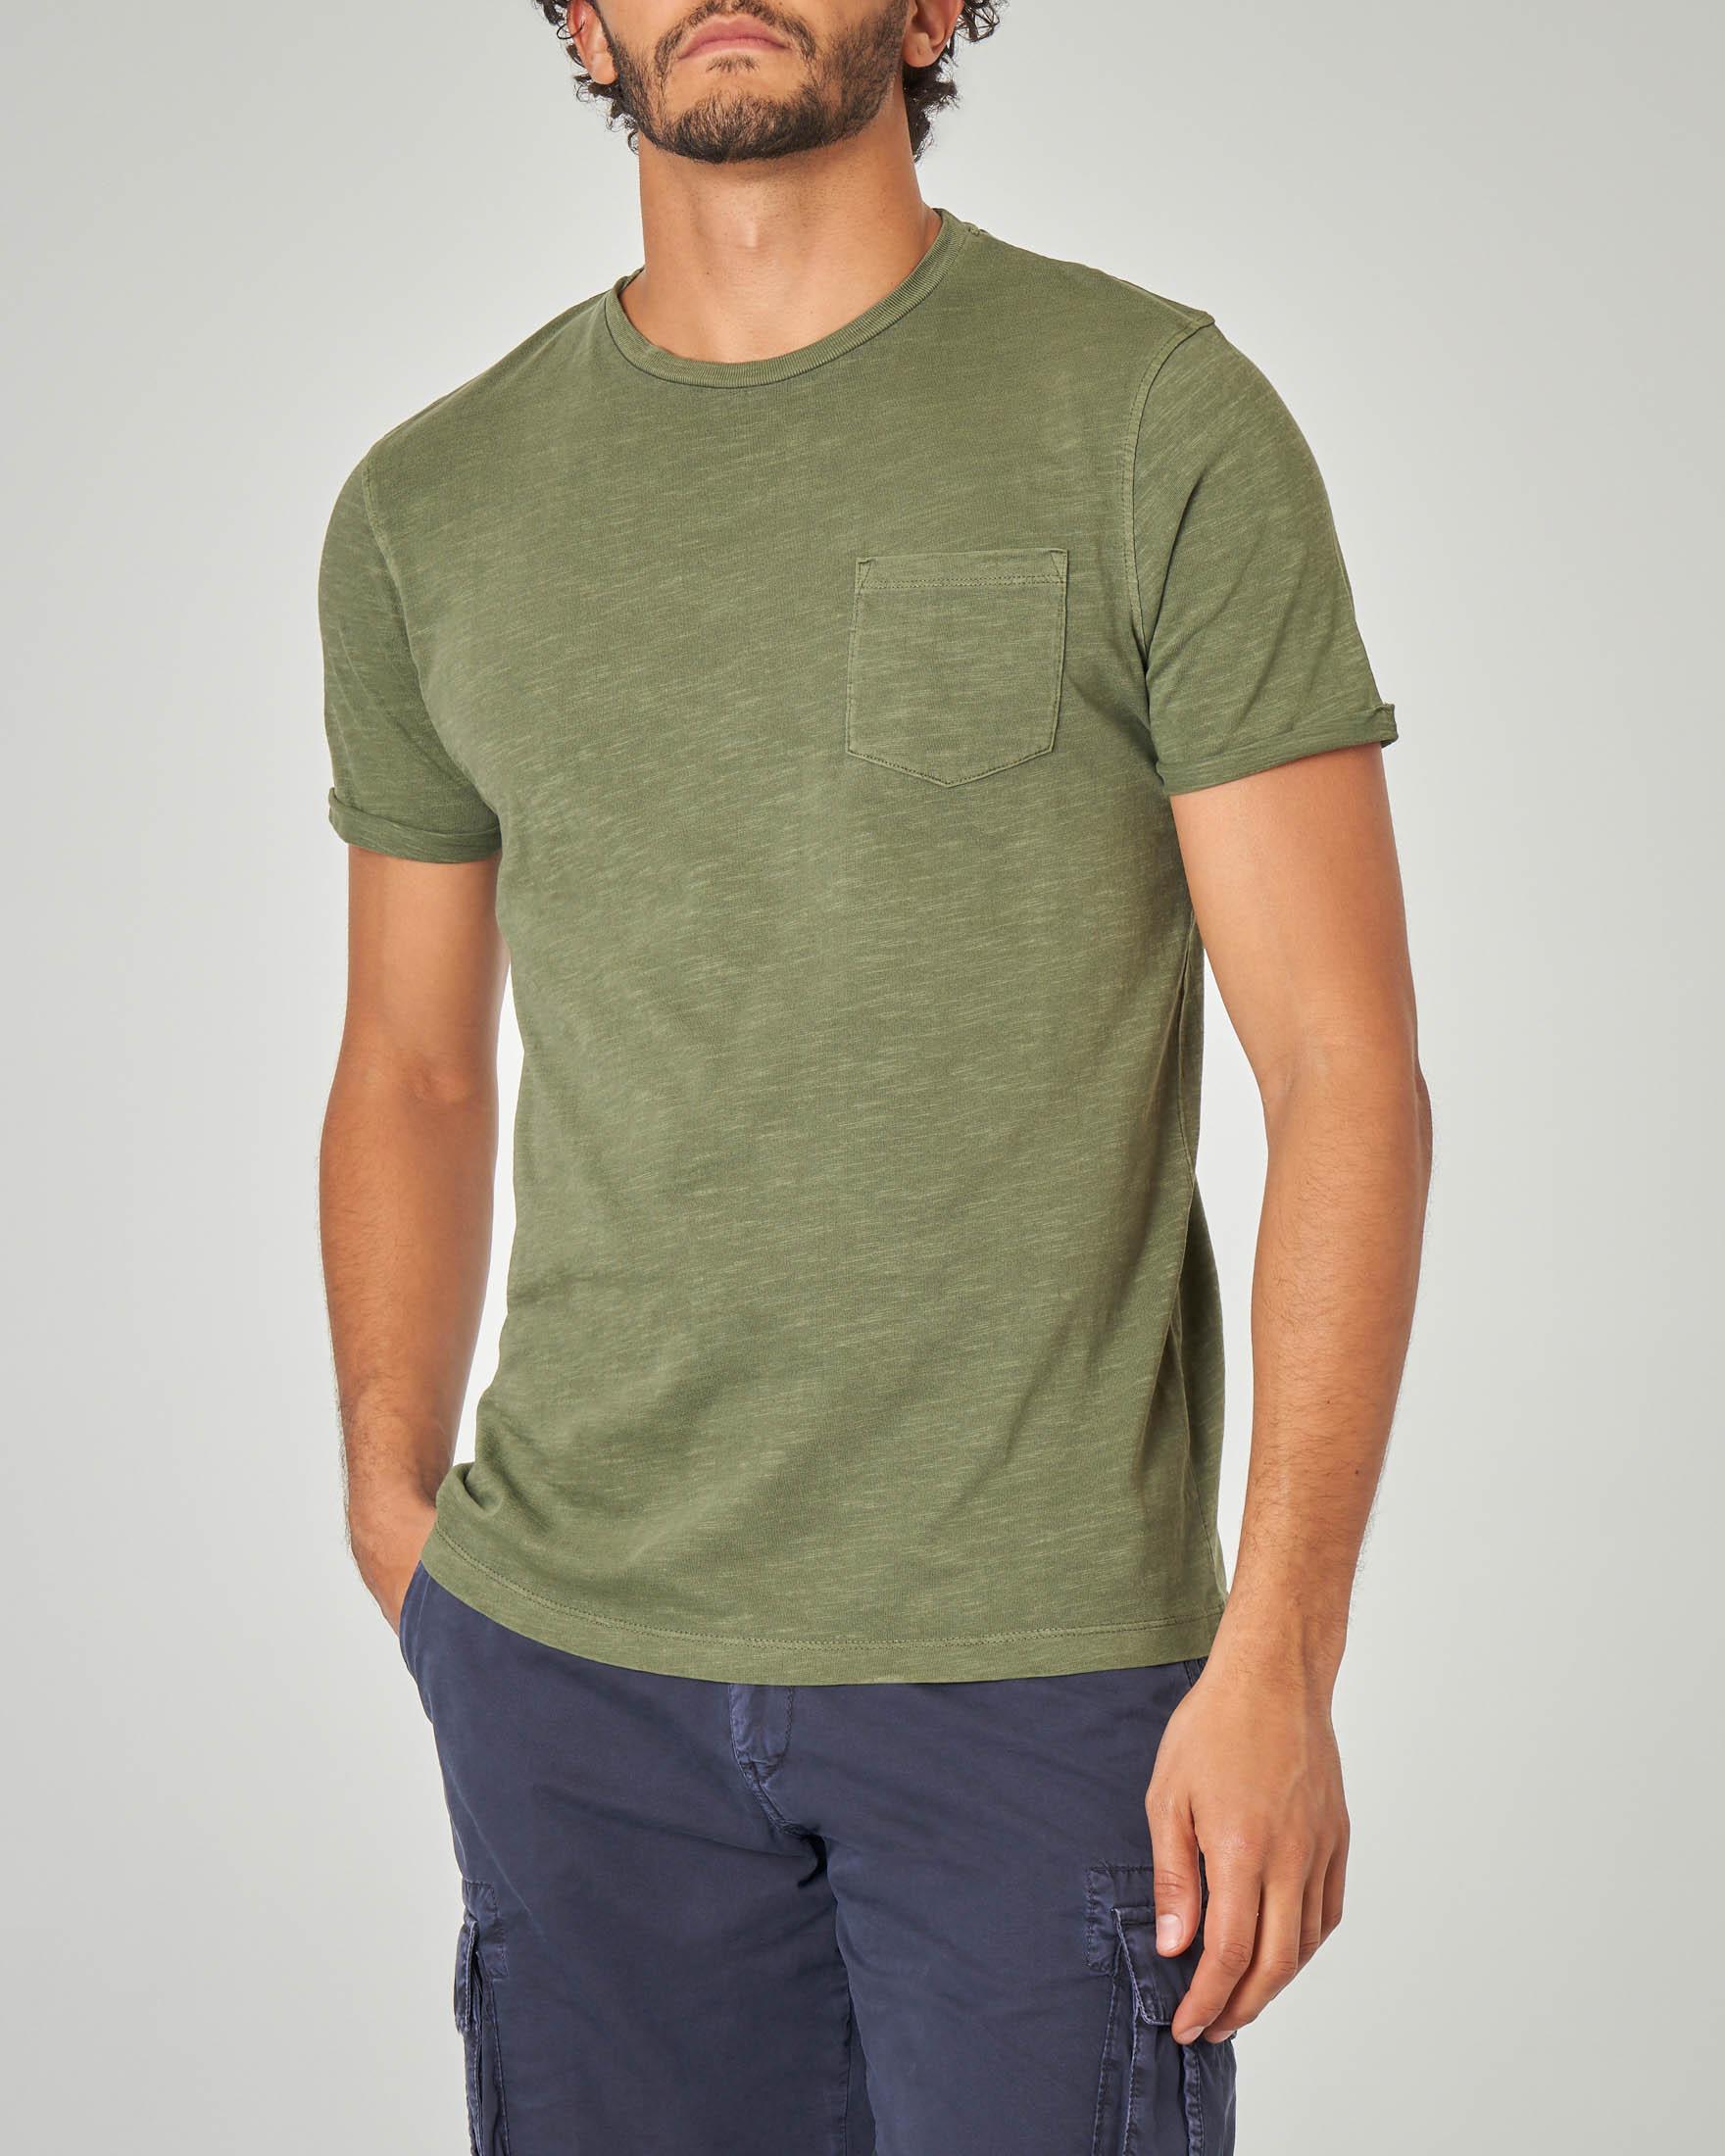 T-shirt verde militare con taschino tessuto slub